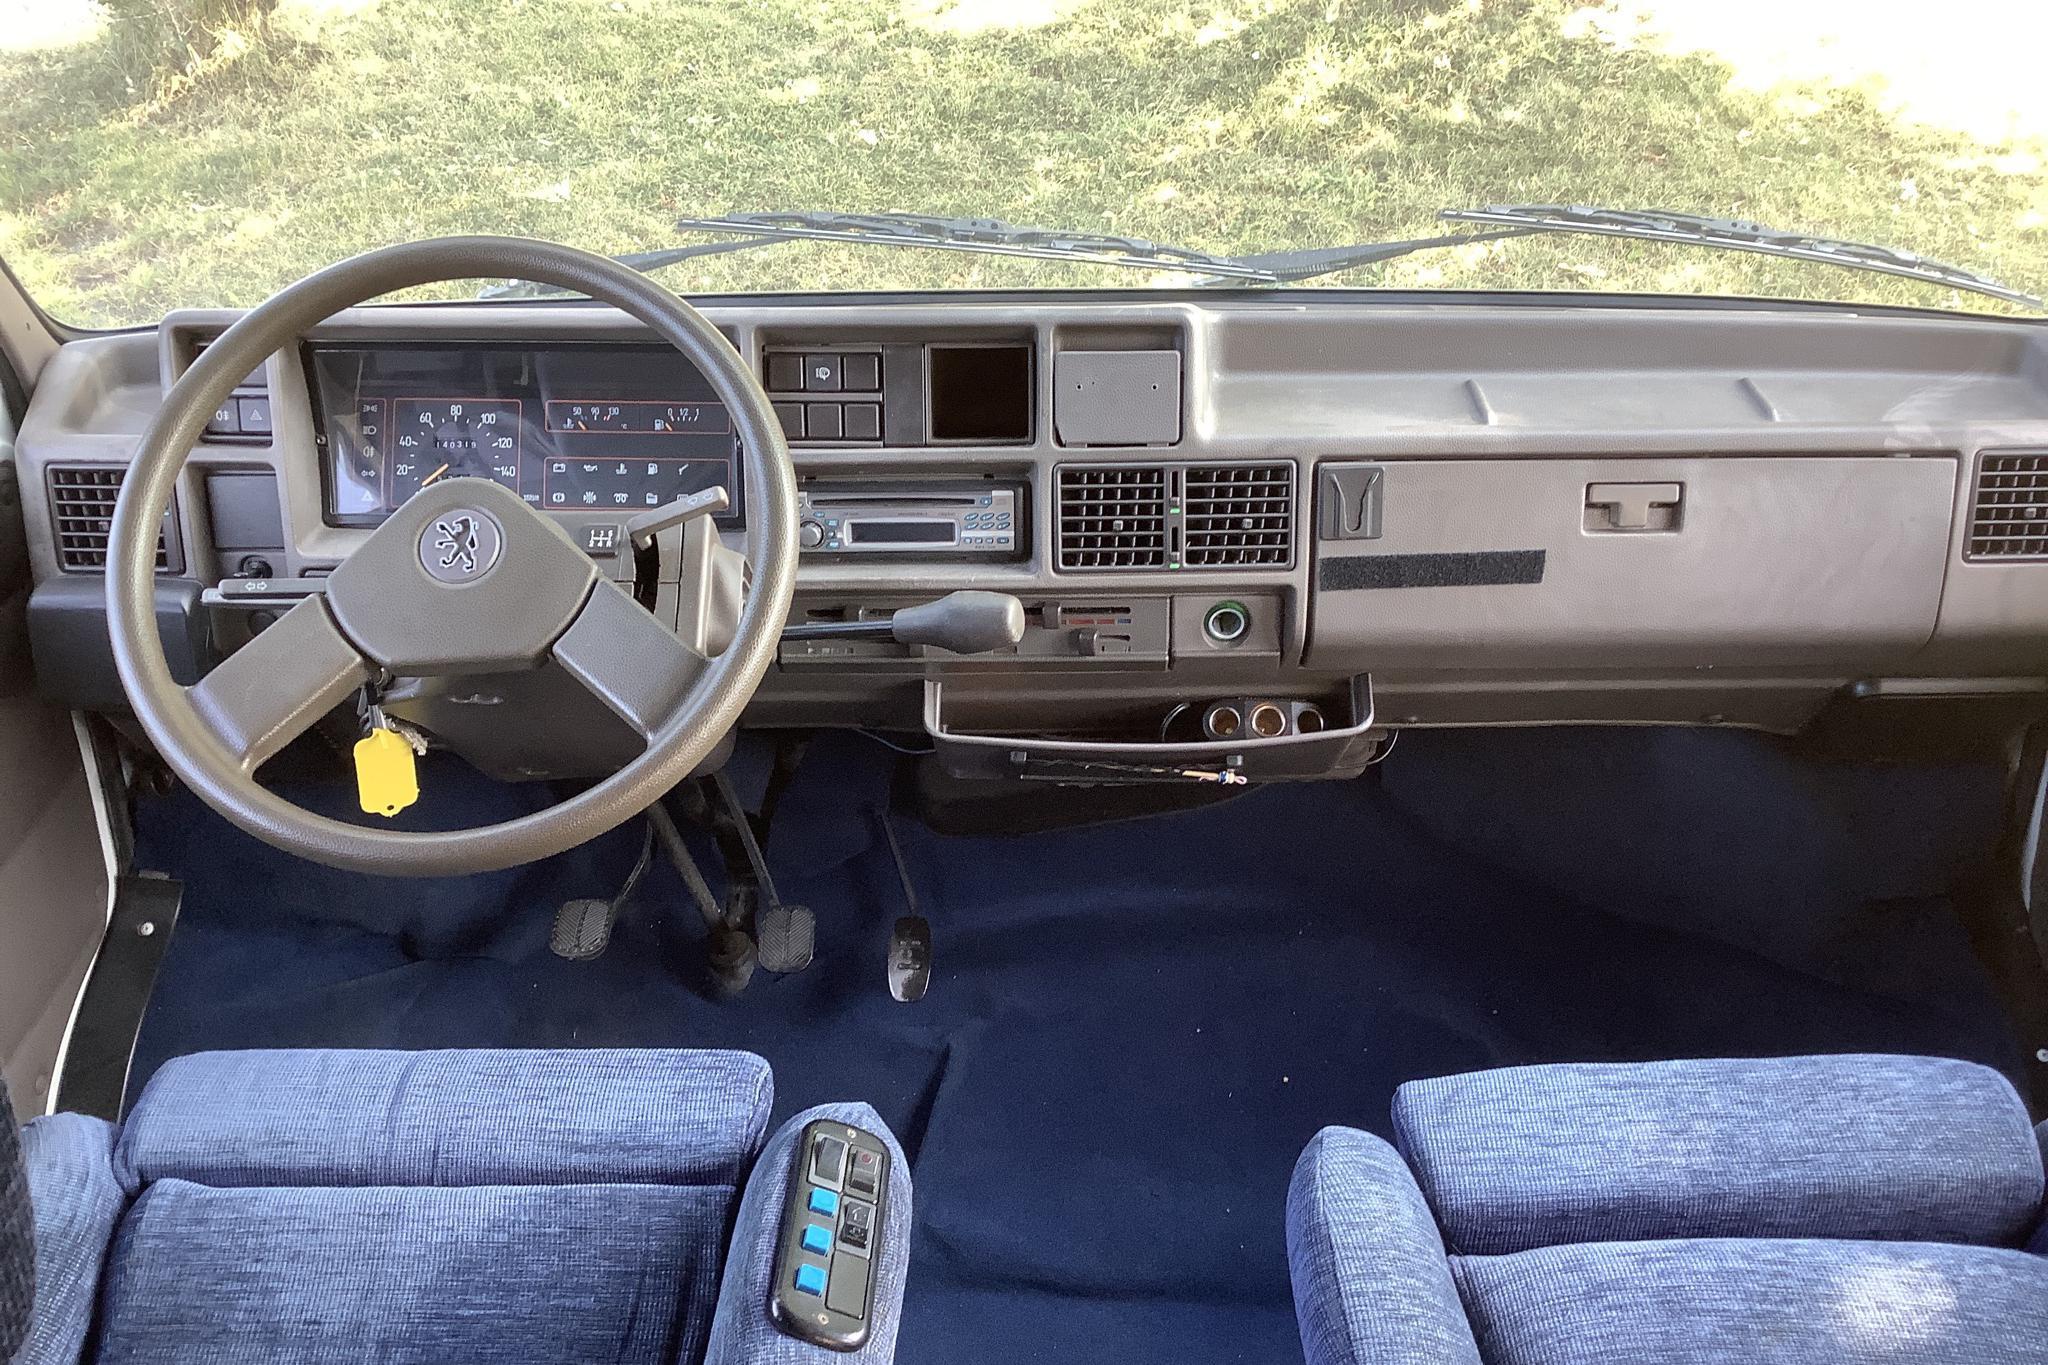 Peugeot LANDÅ 6-6 Husbil - 14 031 mil - Manuell - vit - 1989